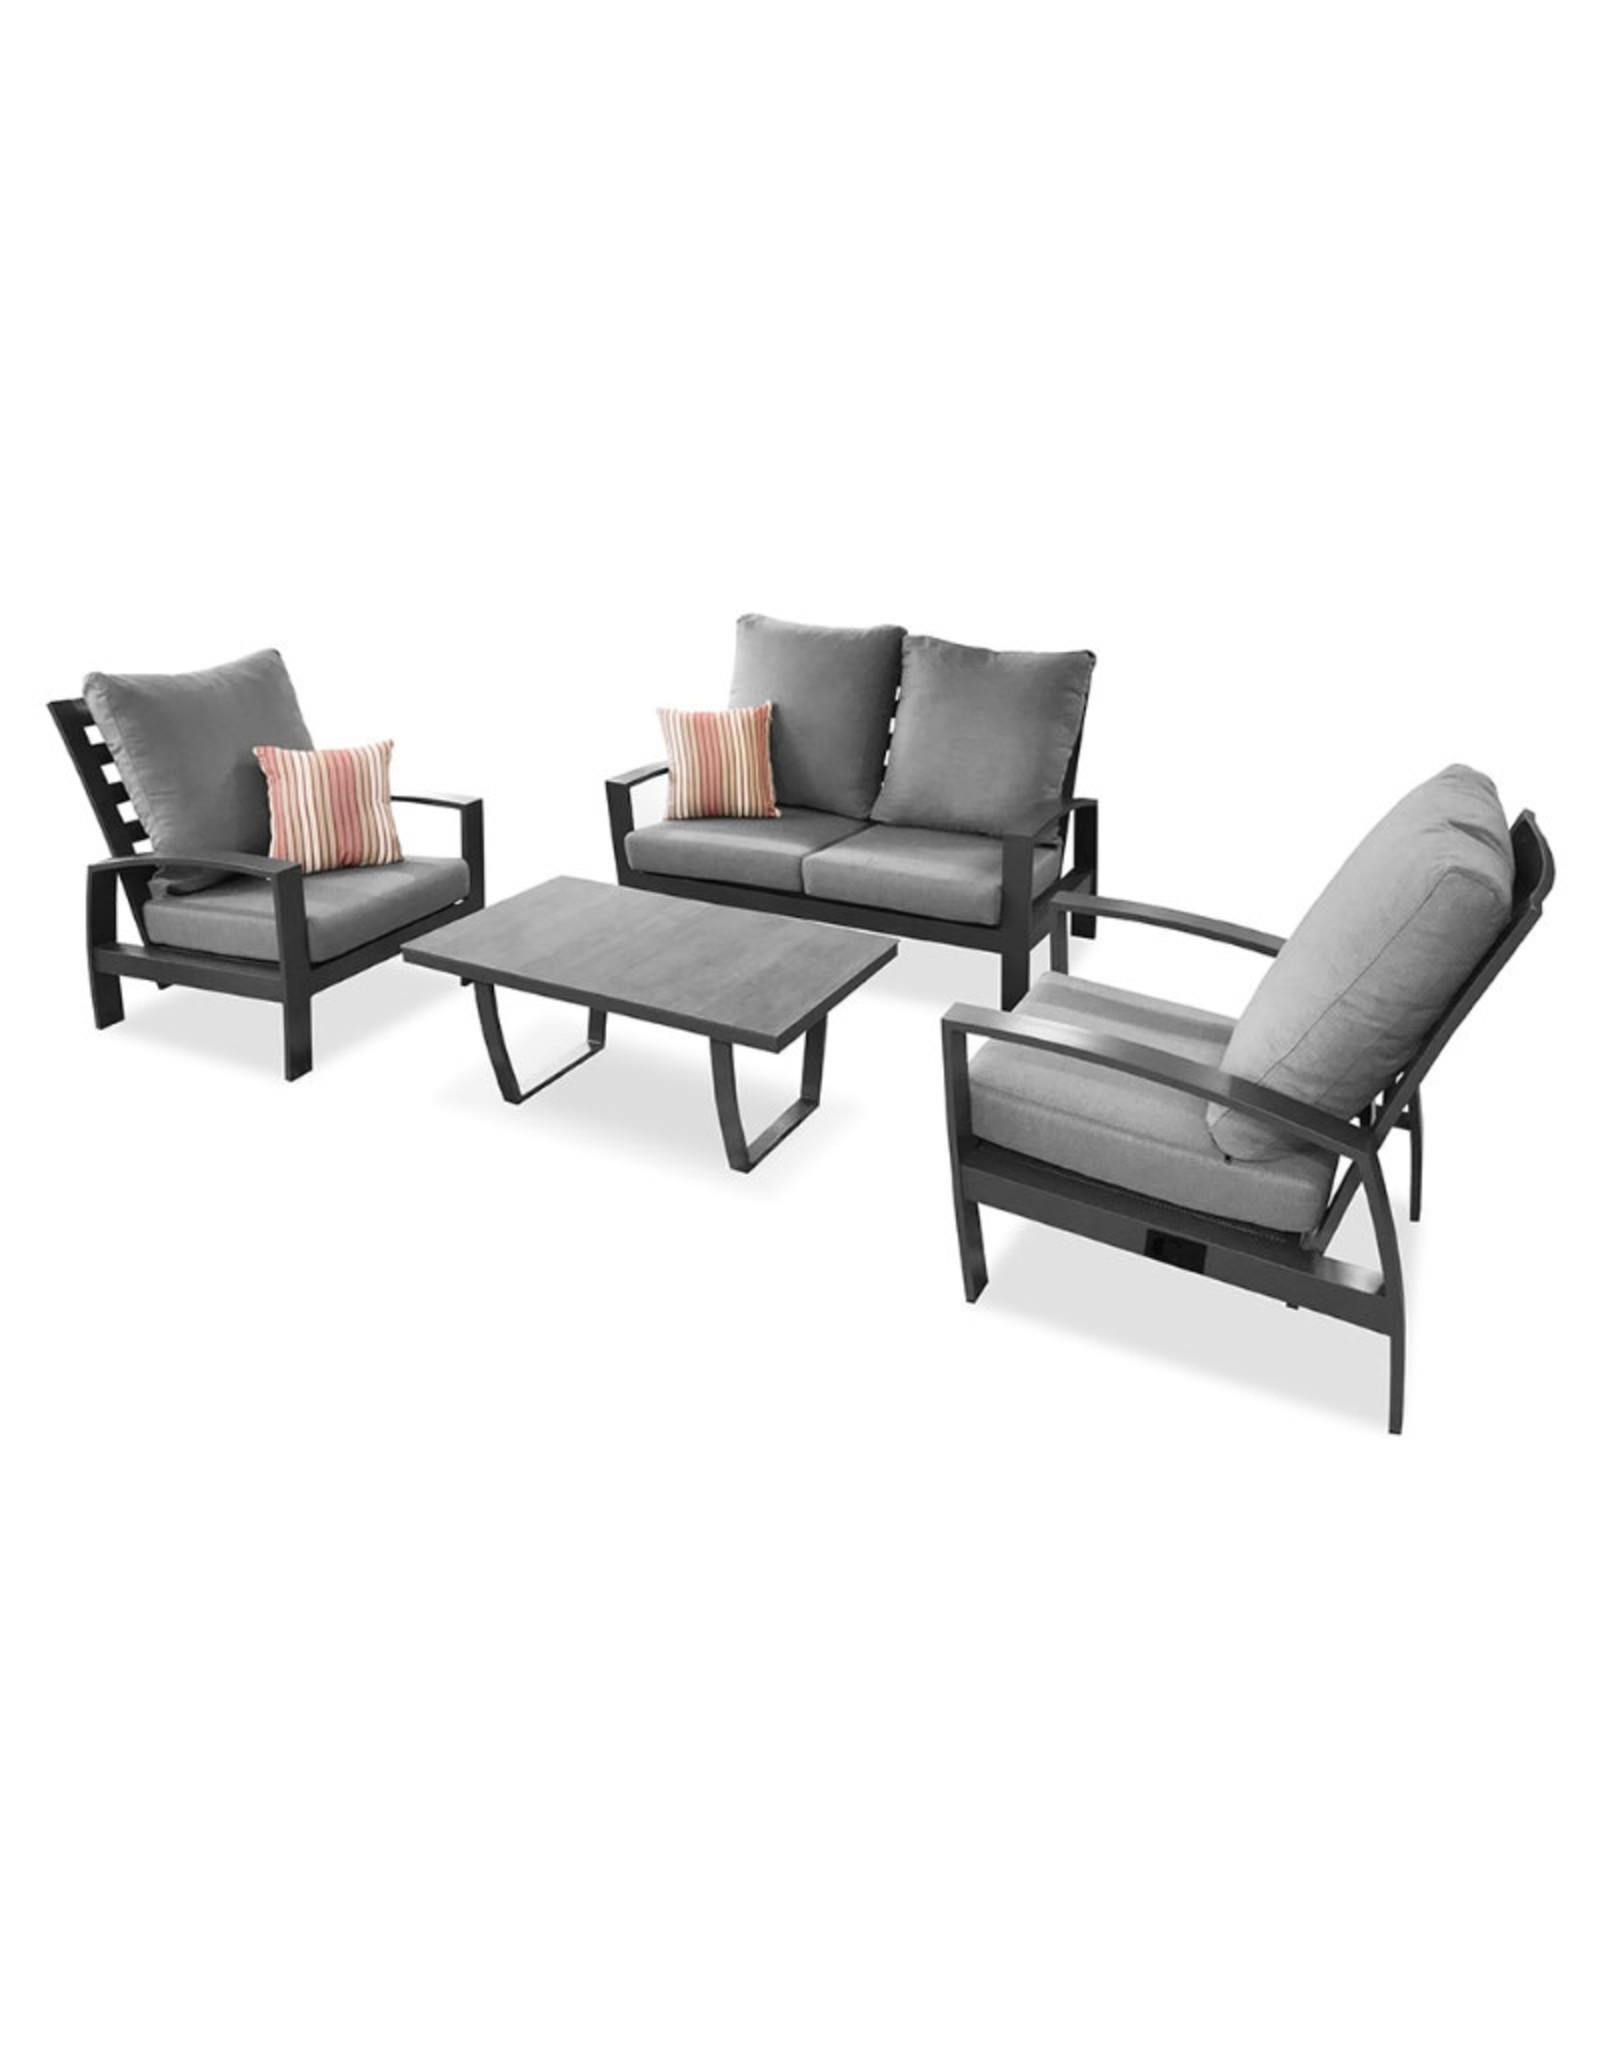 Tierra Outdoor Tierra Outdoor Valencia Lounge Chair Charcoal